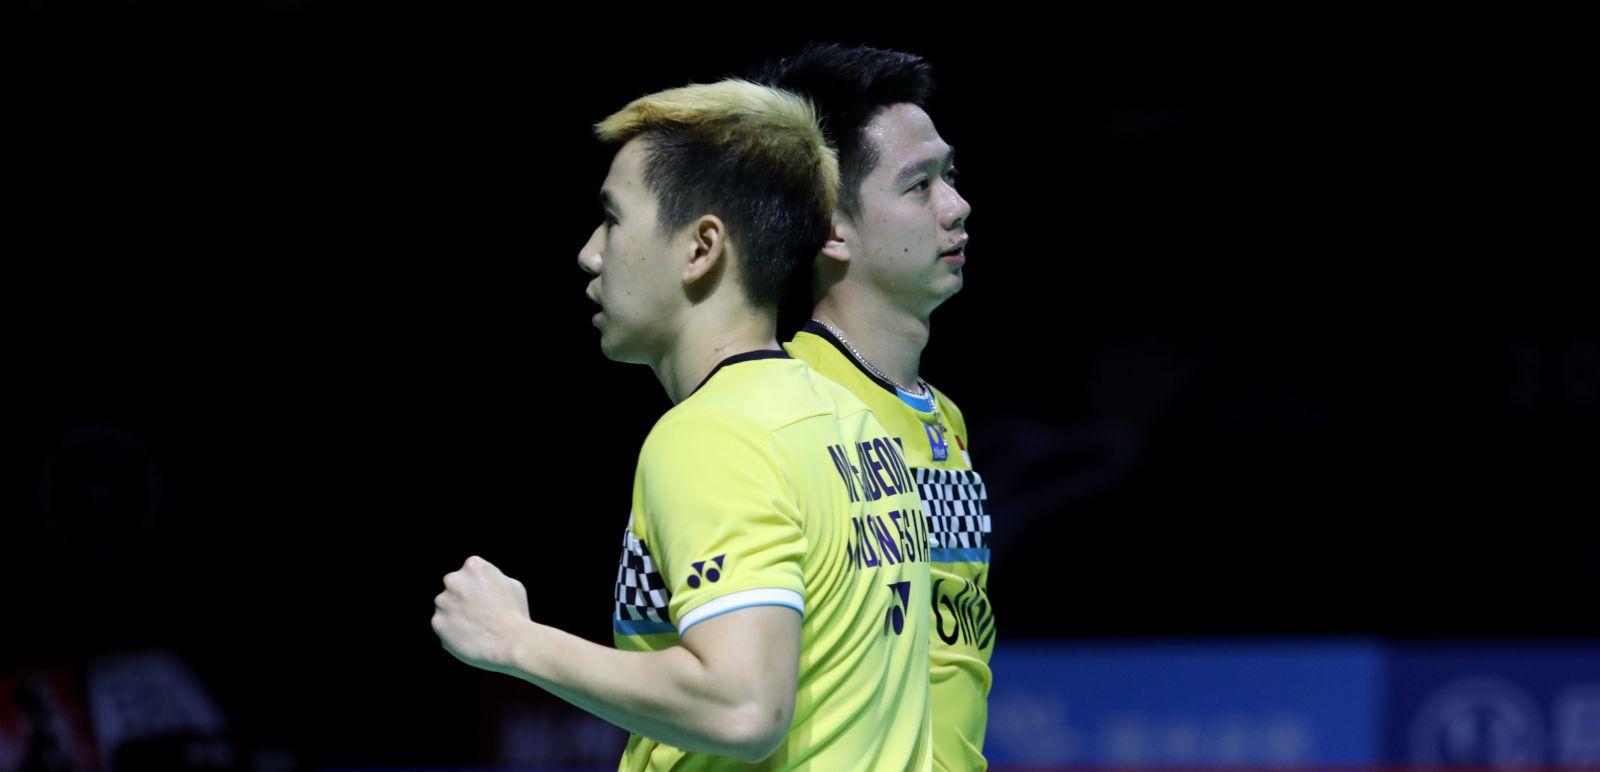 Ganda putra Indonesia Marcus Fernaldi Gideon/Kevin Sanjaya Sukamuljo alias Minions harus melakoni tiga gim pada babak kedua Hong Kong Open 2019. Foto: PBSI